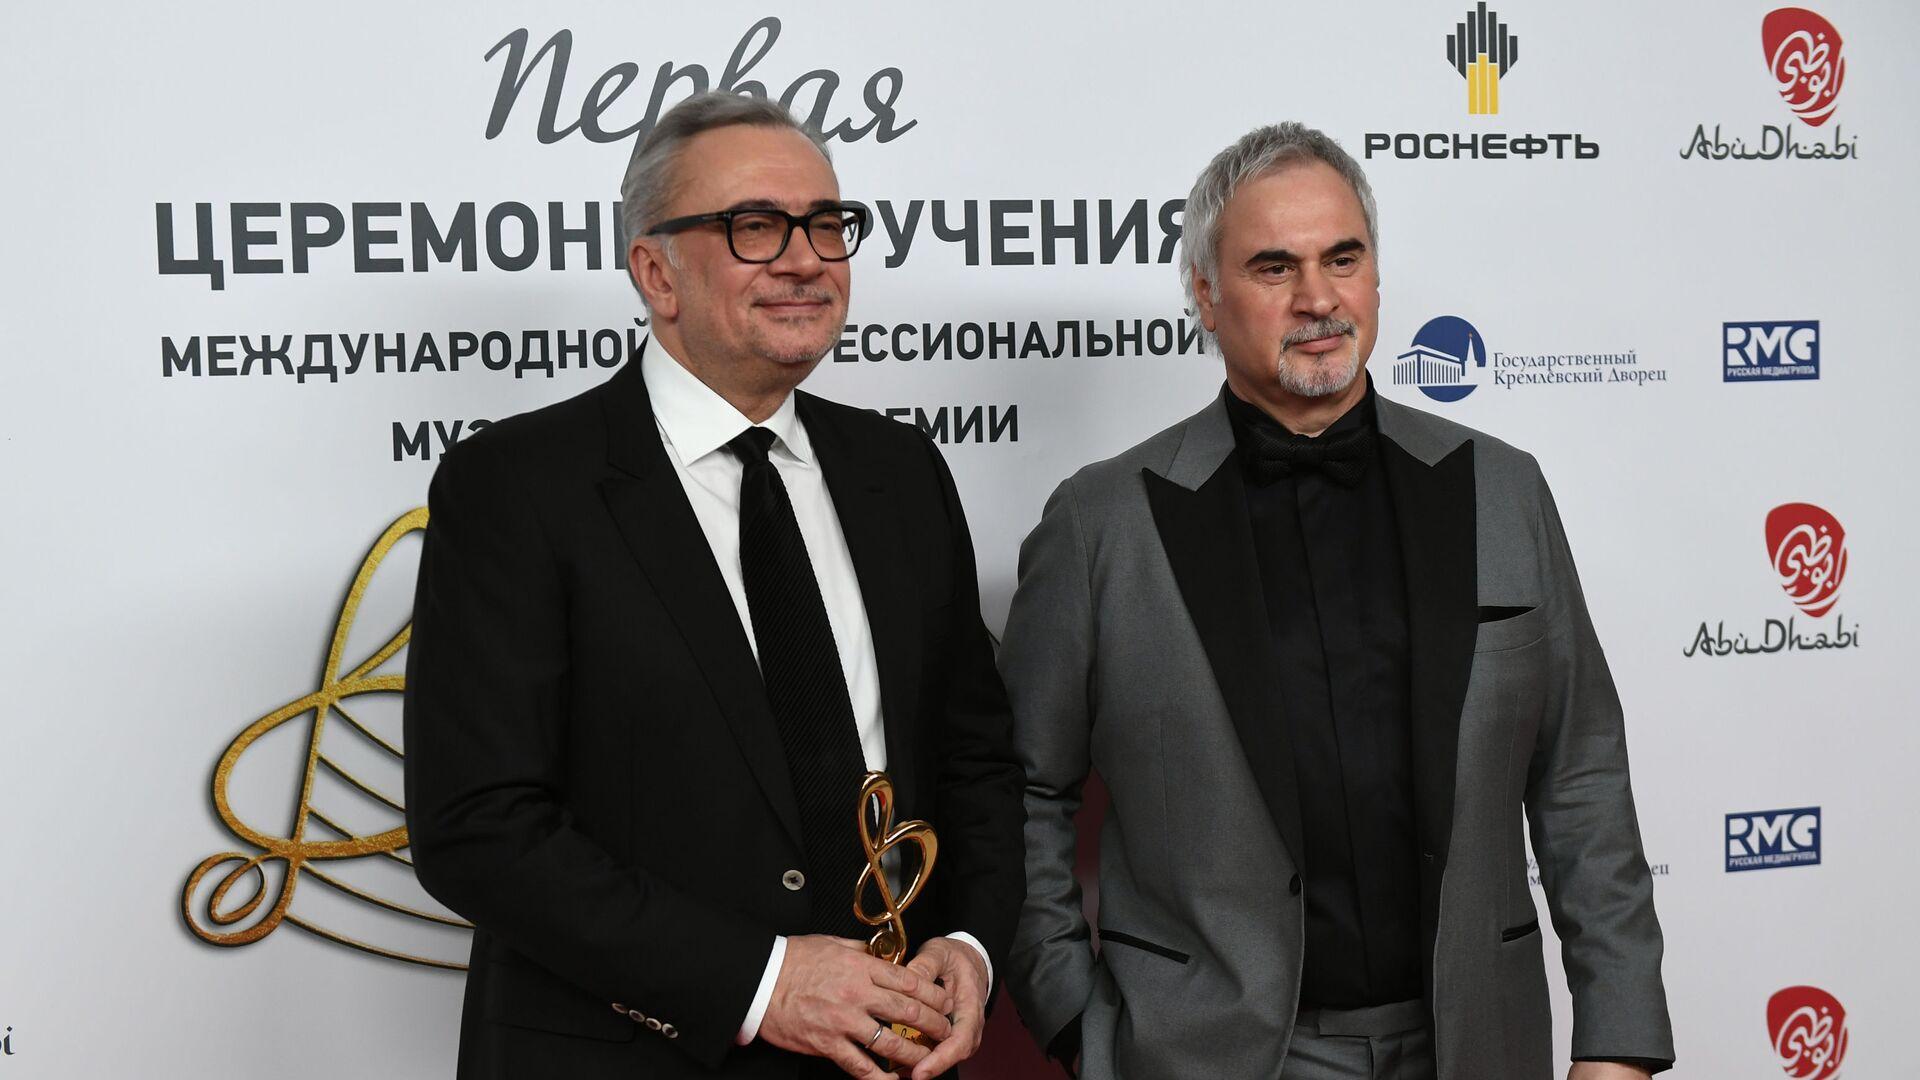 Композитор Константин Меладзе (слева) и певец Валерий Меладзе - Sputnik Грузия, 1920, 18.02.2021